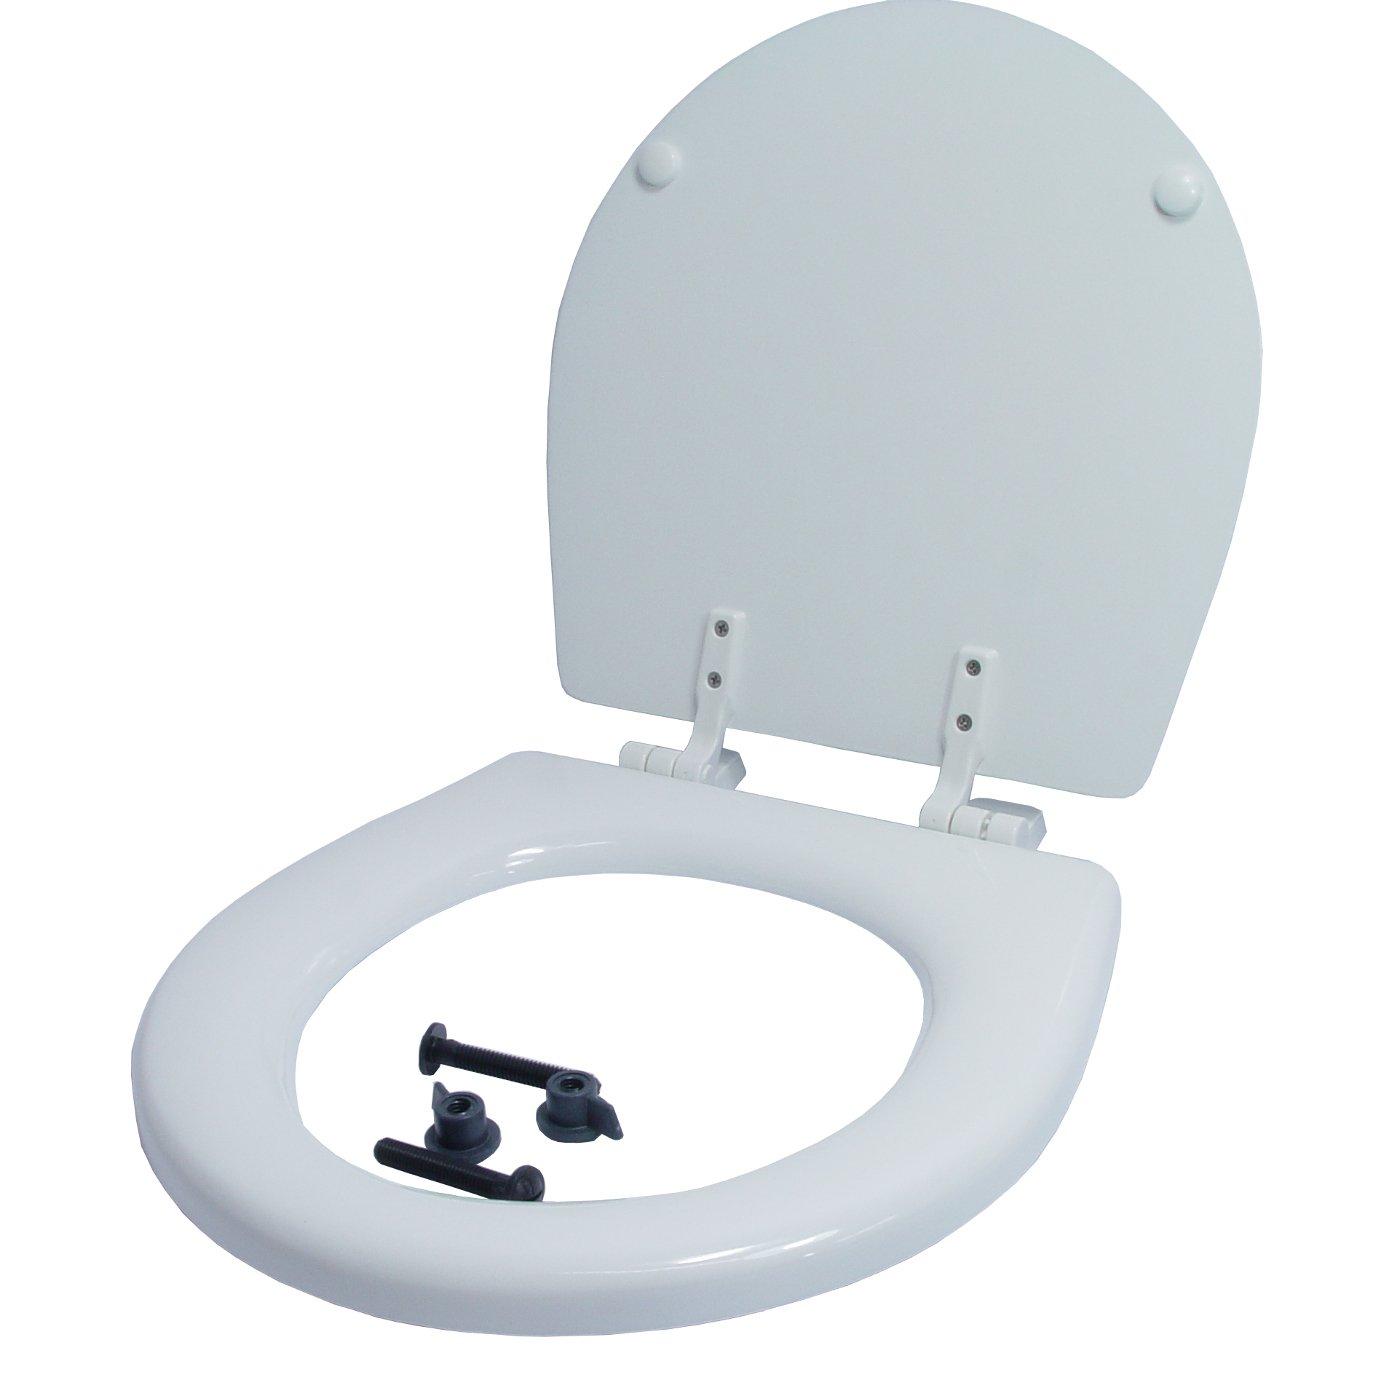 Jabsco Toilet Seat Lid Hinge Set Velcromag